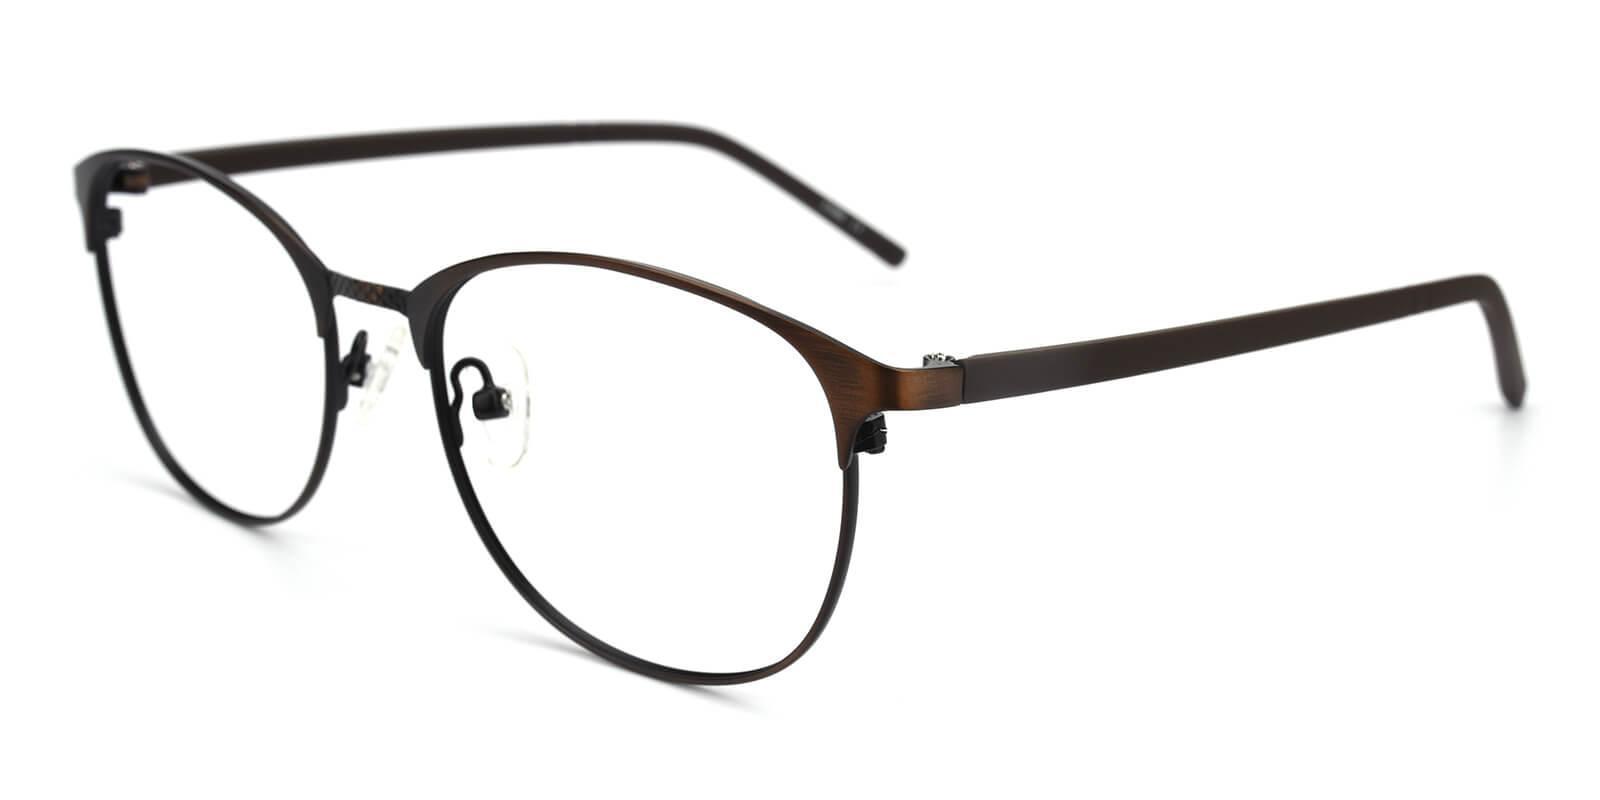 Gorge-Brown-Round-Metal-Eyeglasses-additional1